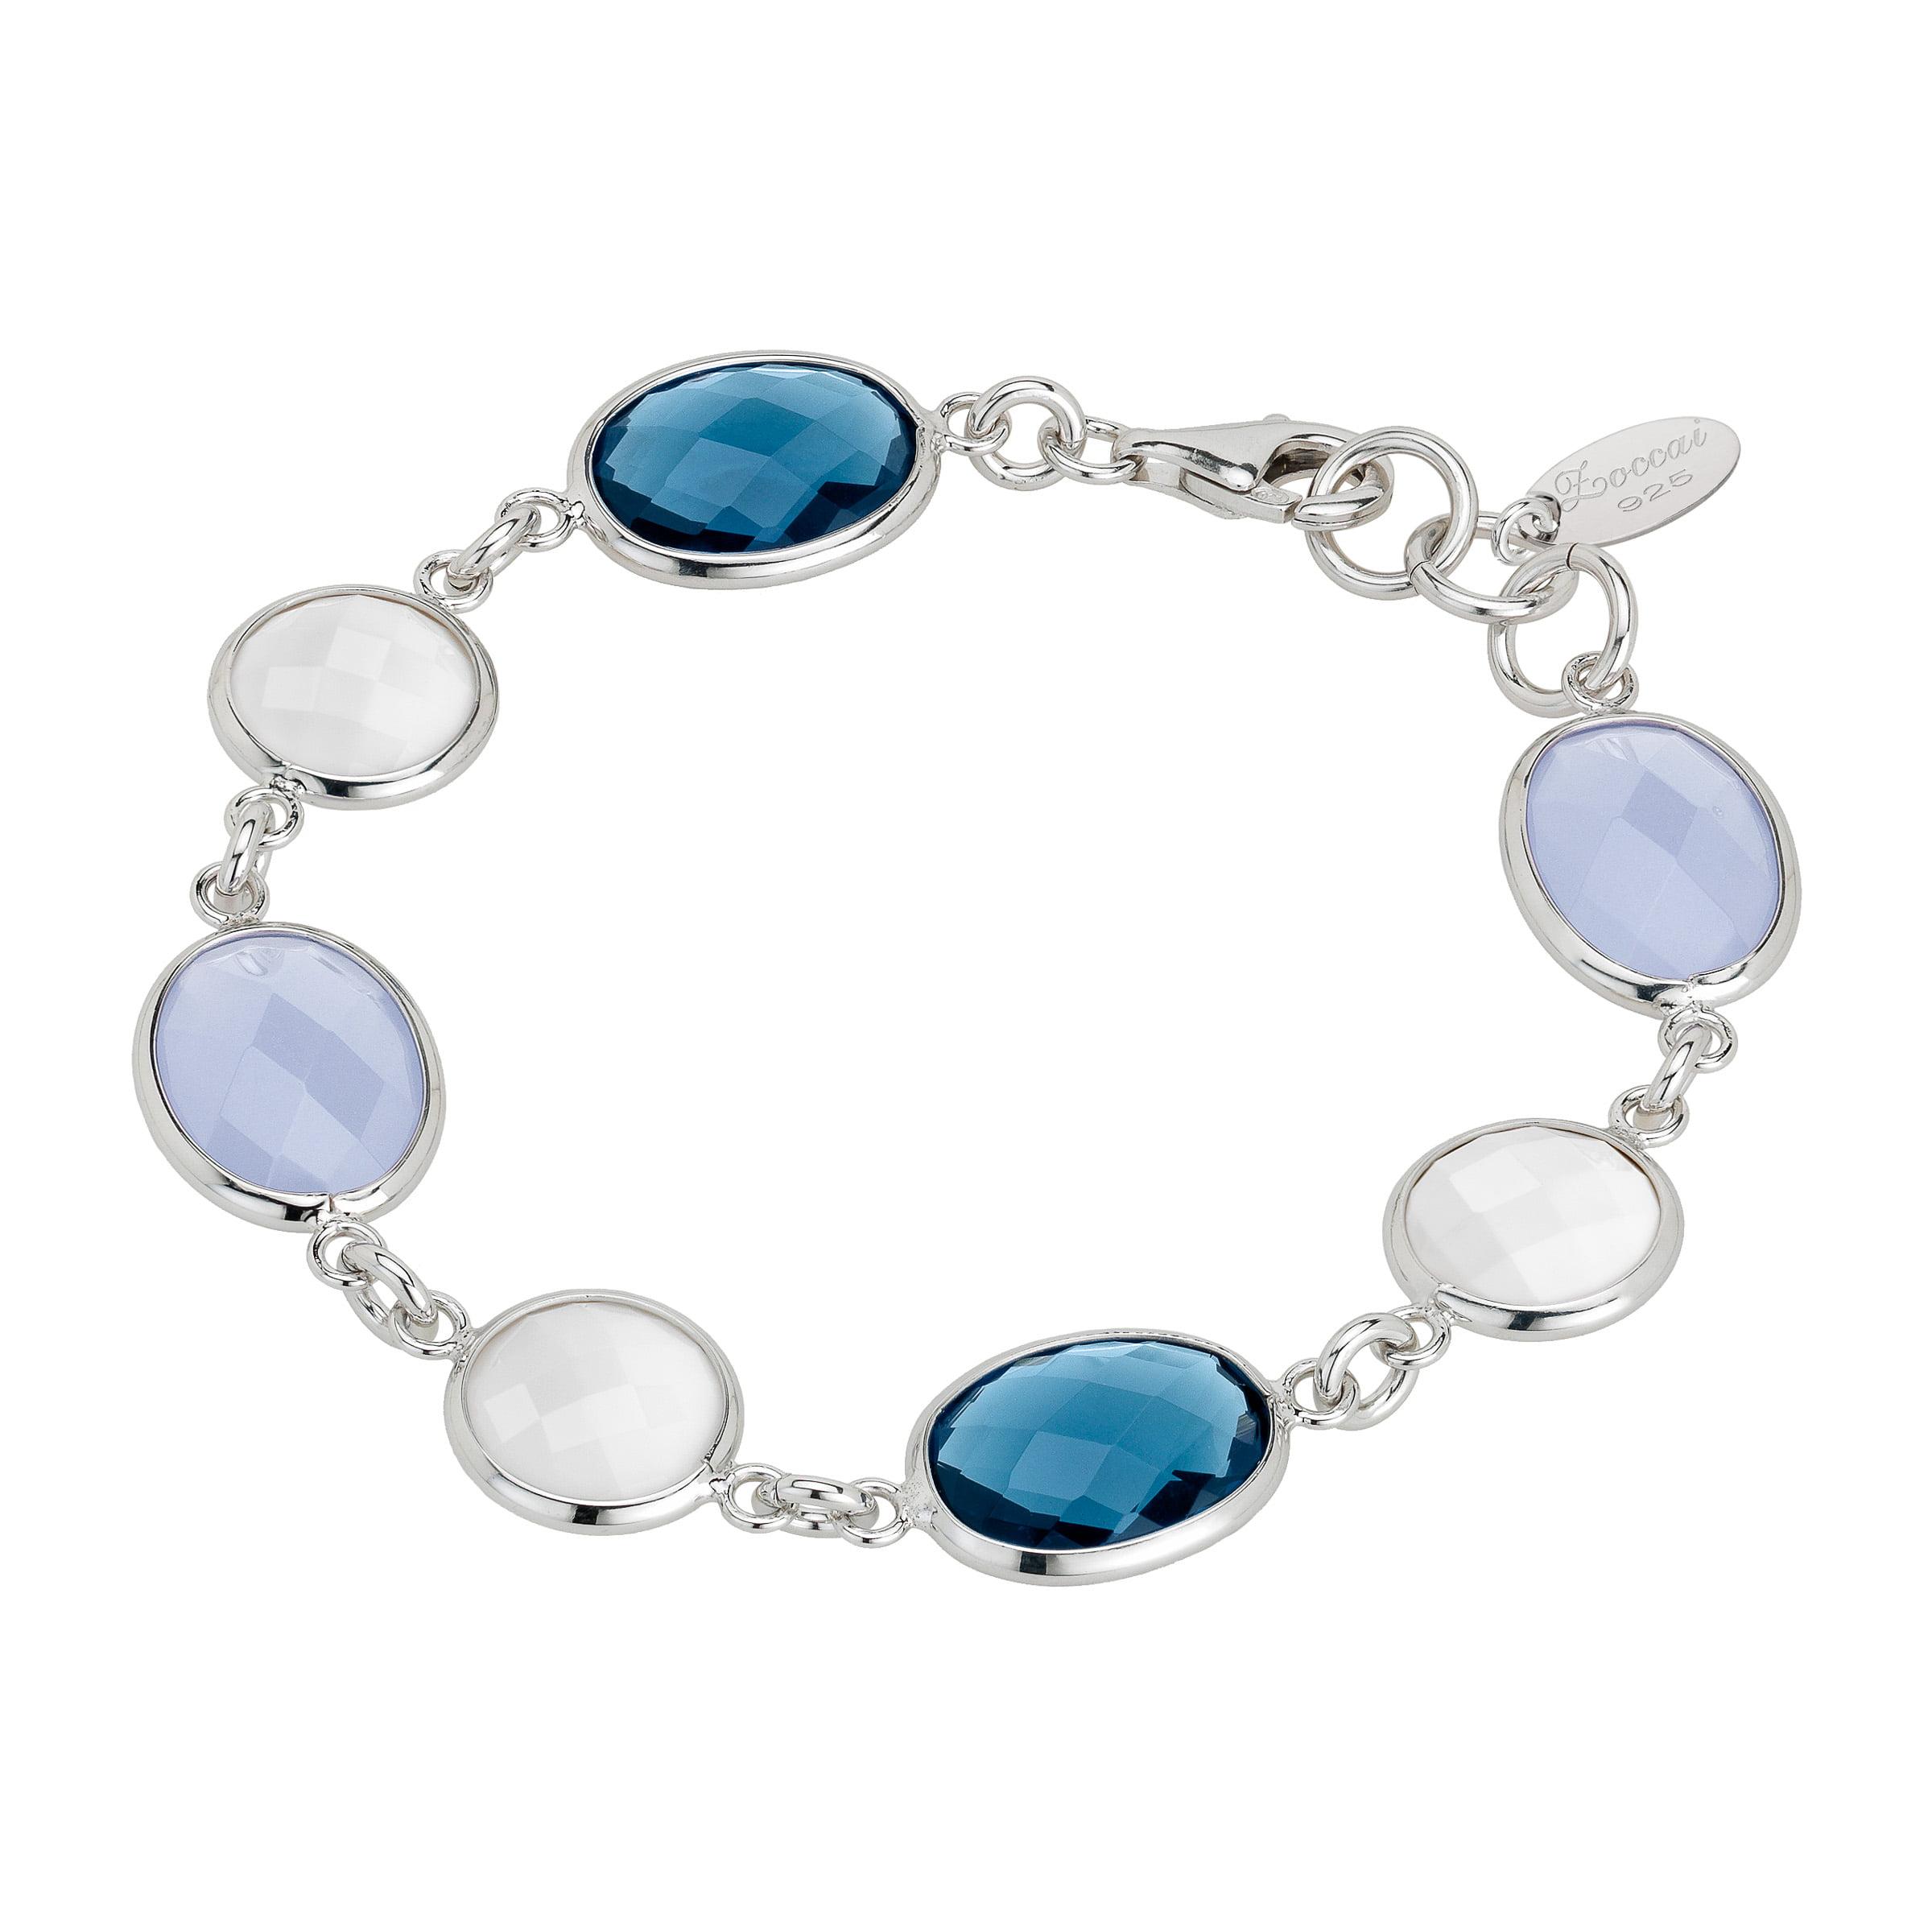 Zoccai 925 Agate, Topaz & Chalcedony Link Bracelet in Sterling Silver by Richline Group